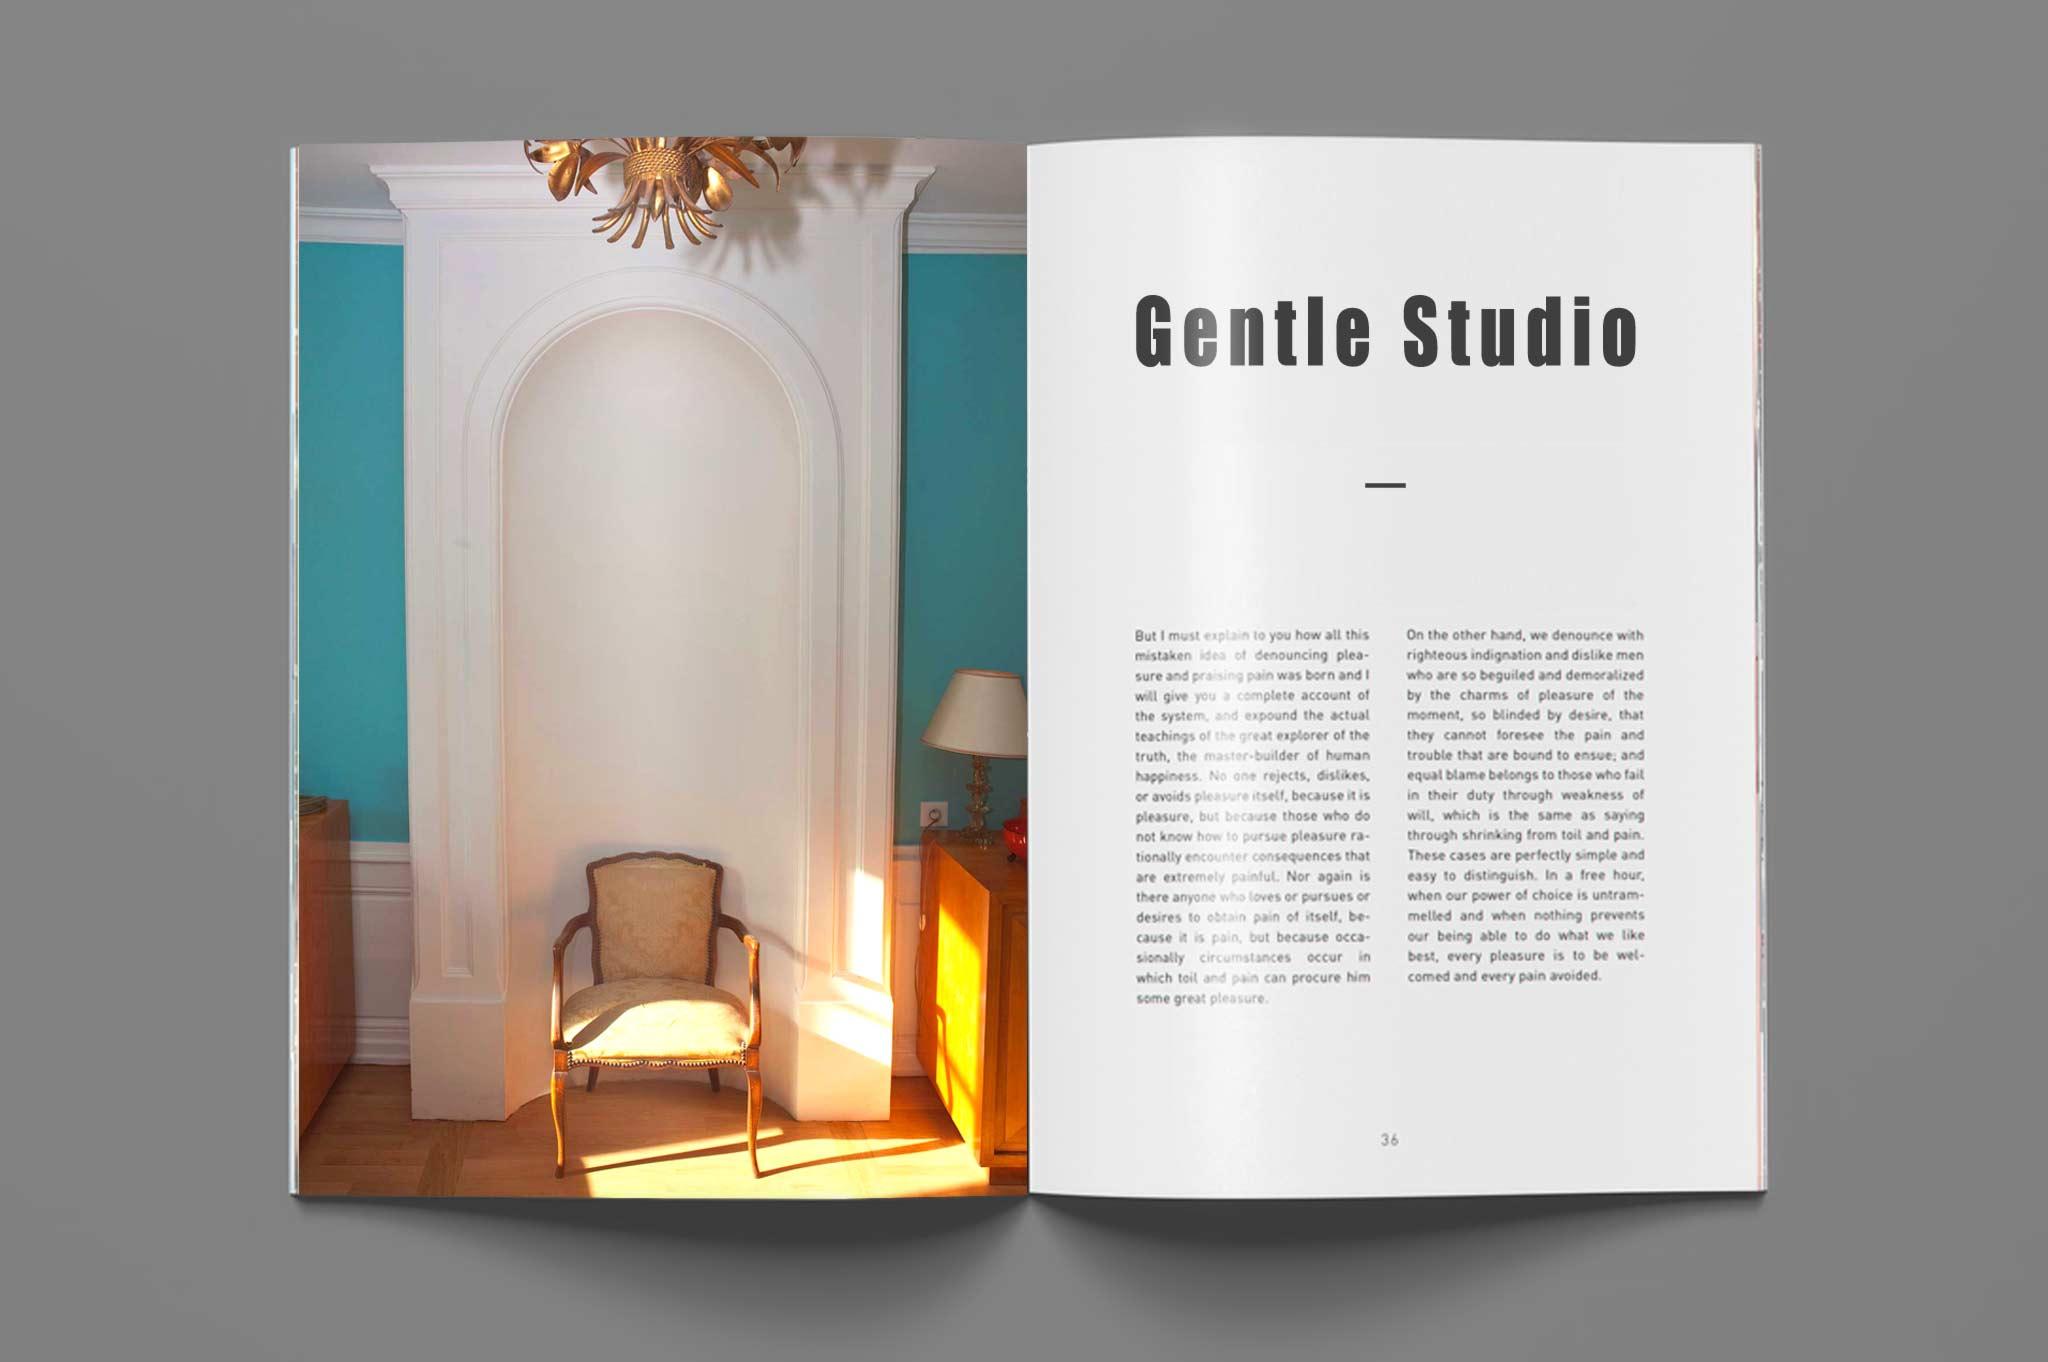 magazine mockup deco architecture interieur gentlestudio photographer photographe immobilier reportage